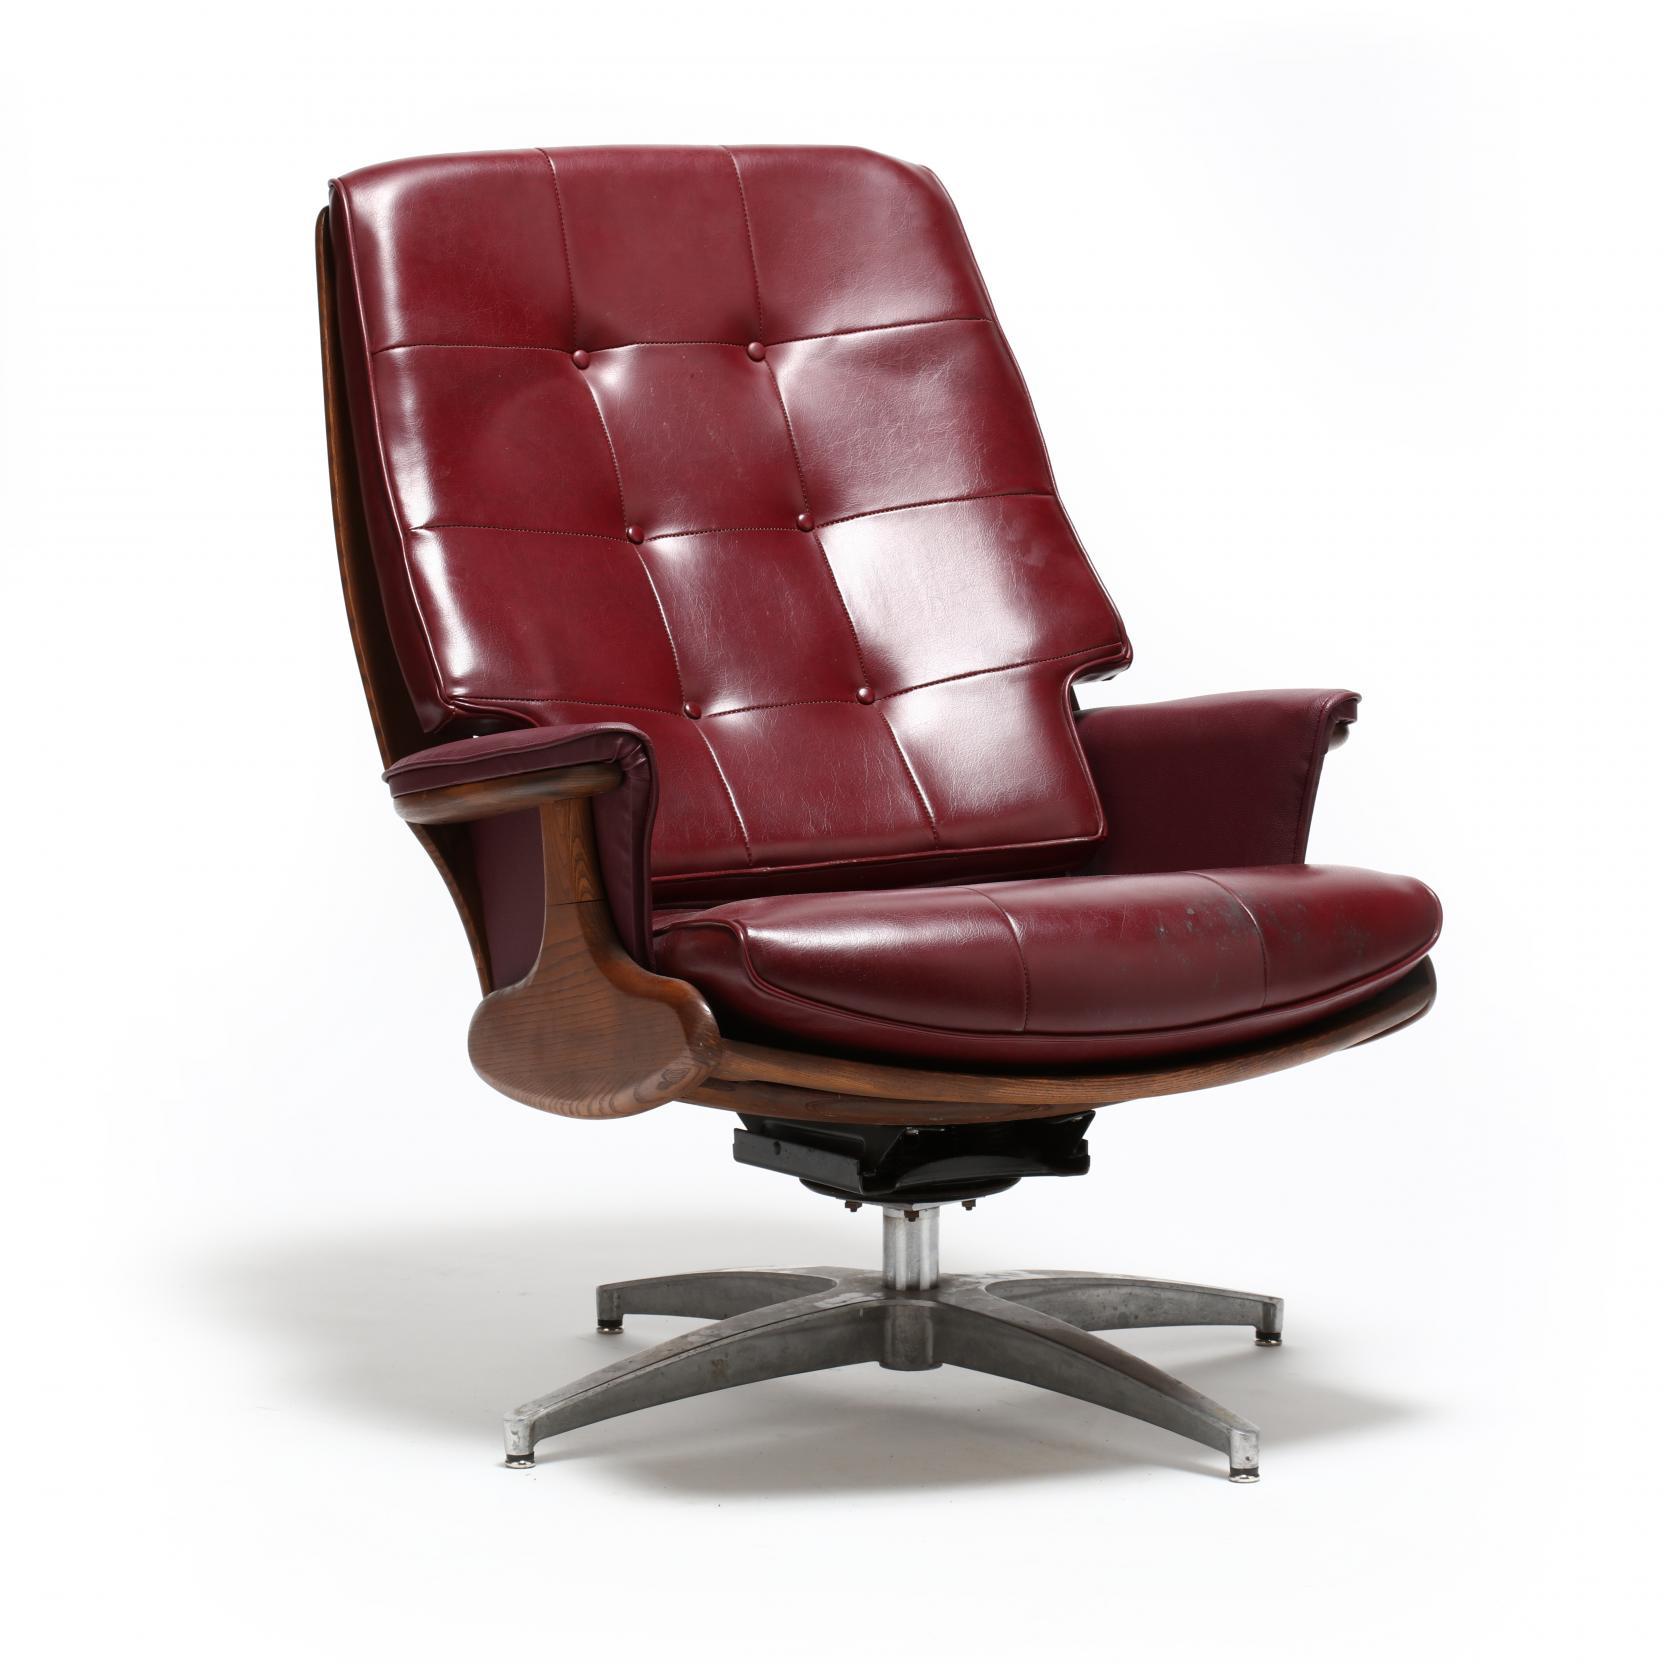 heywood-wakefield-swivel-lounge-chair